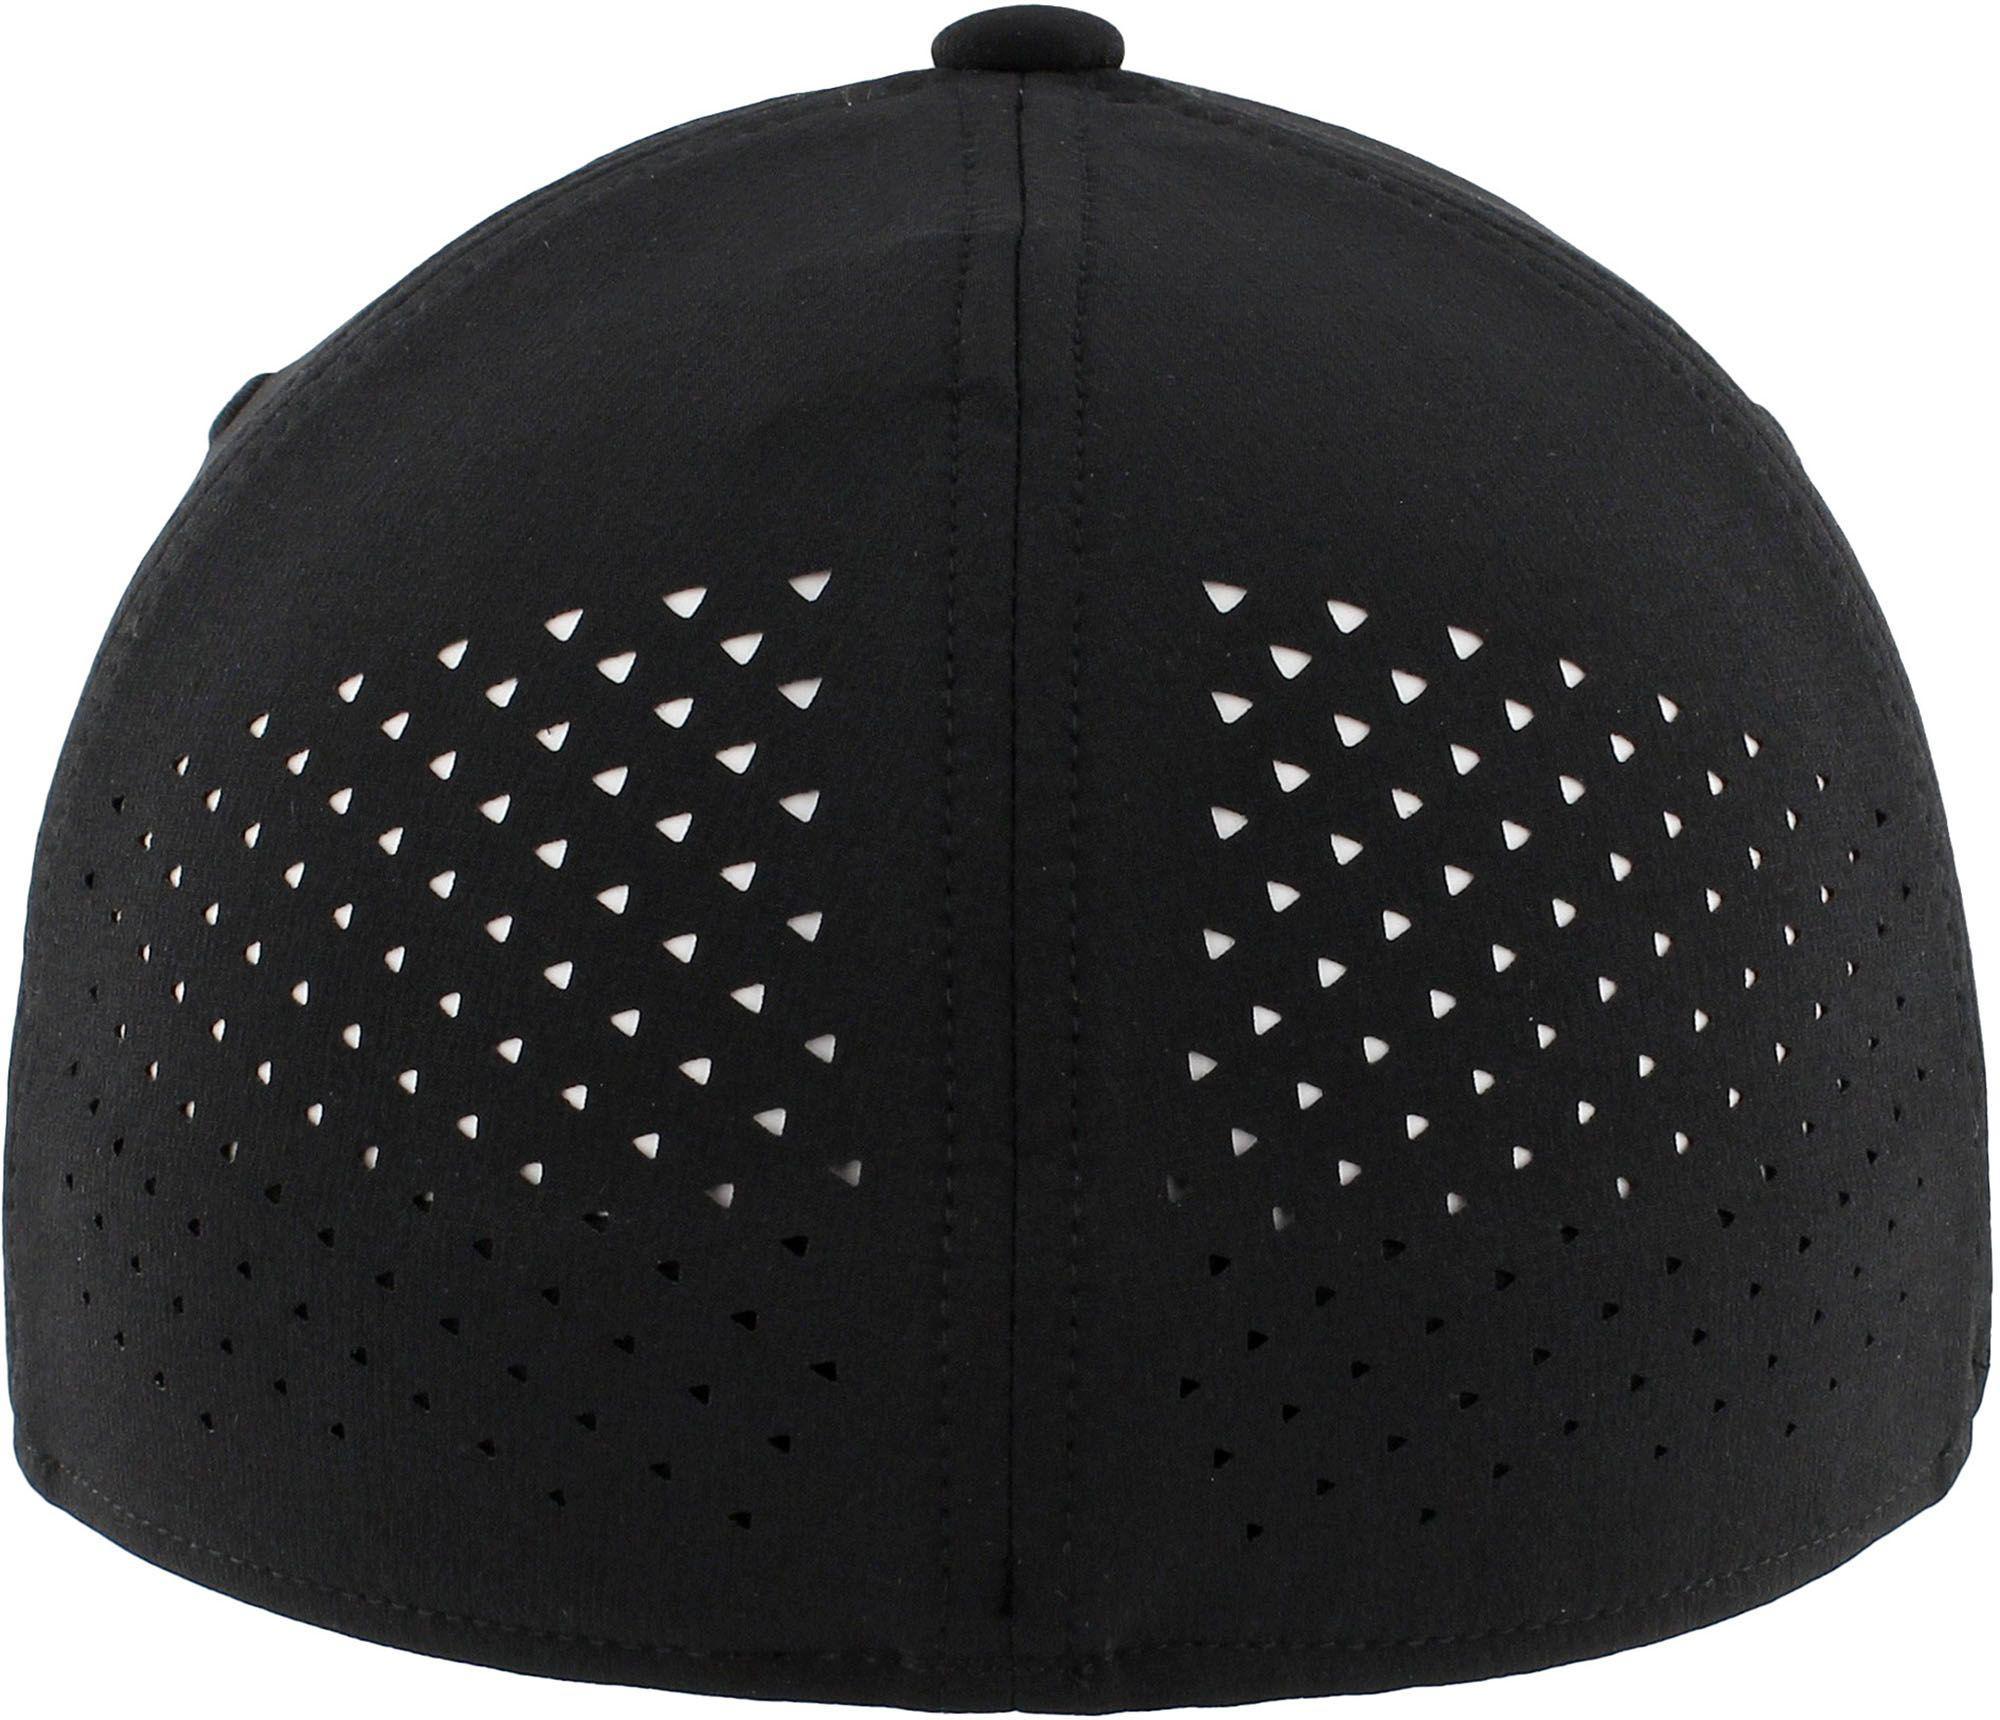 Adidas - Black Gameday Stretch Fit Hat for Men - Lyst. View fullscreen 54dac733a5d6